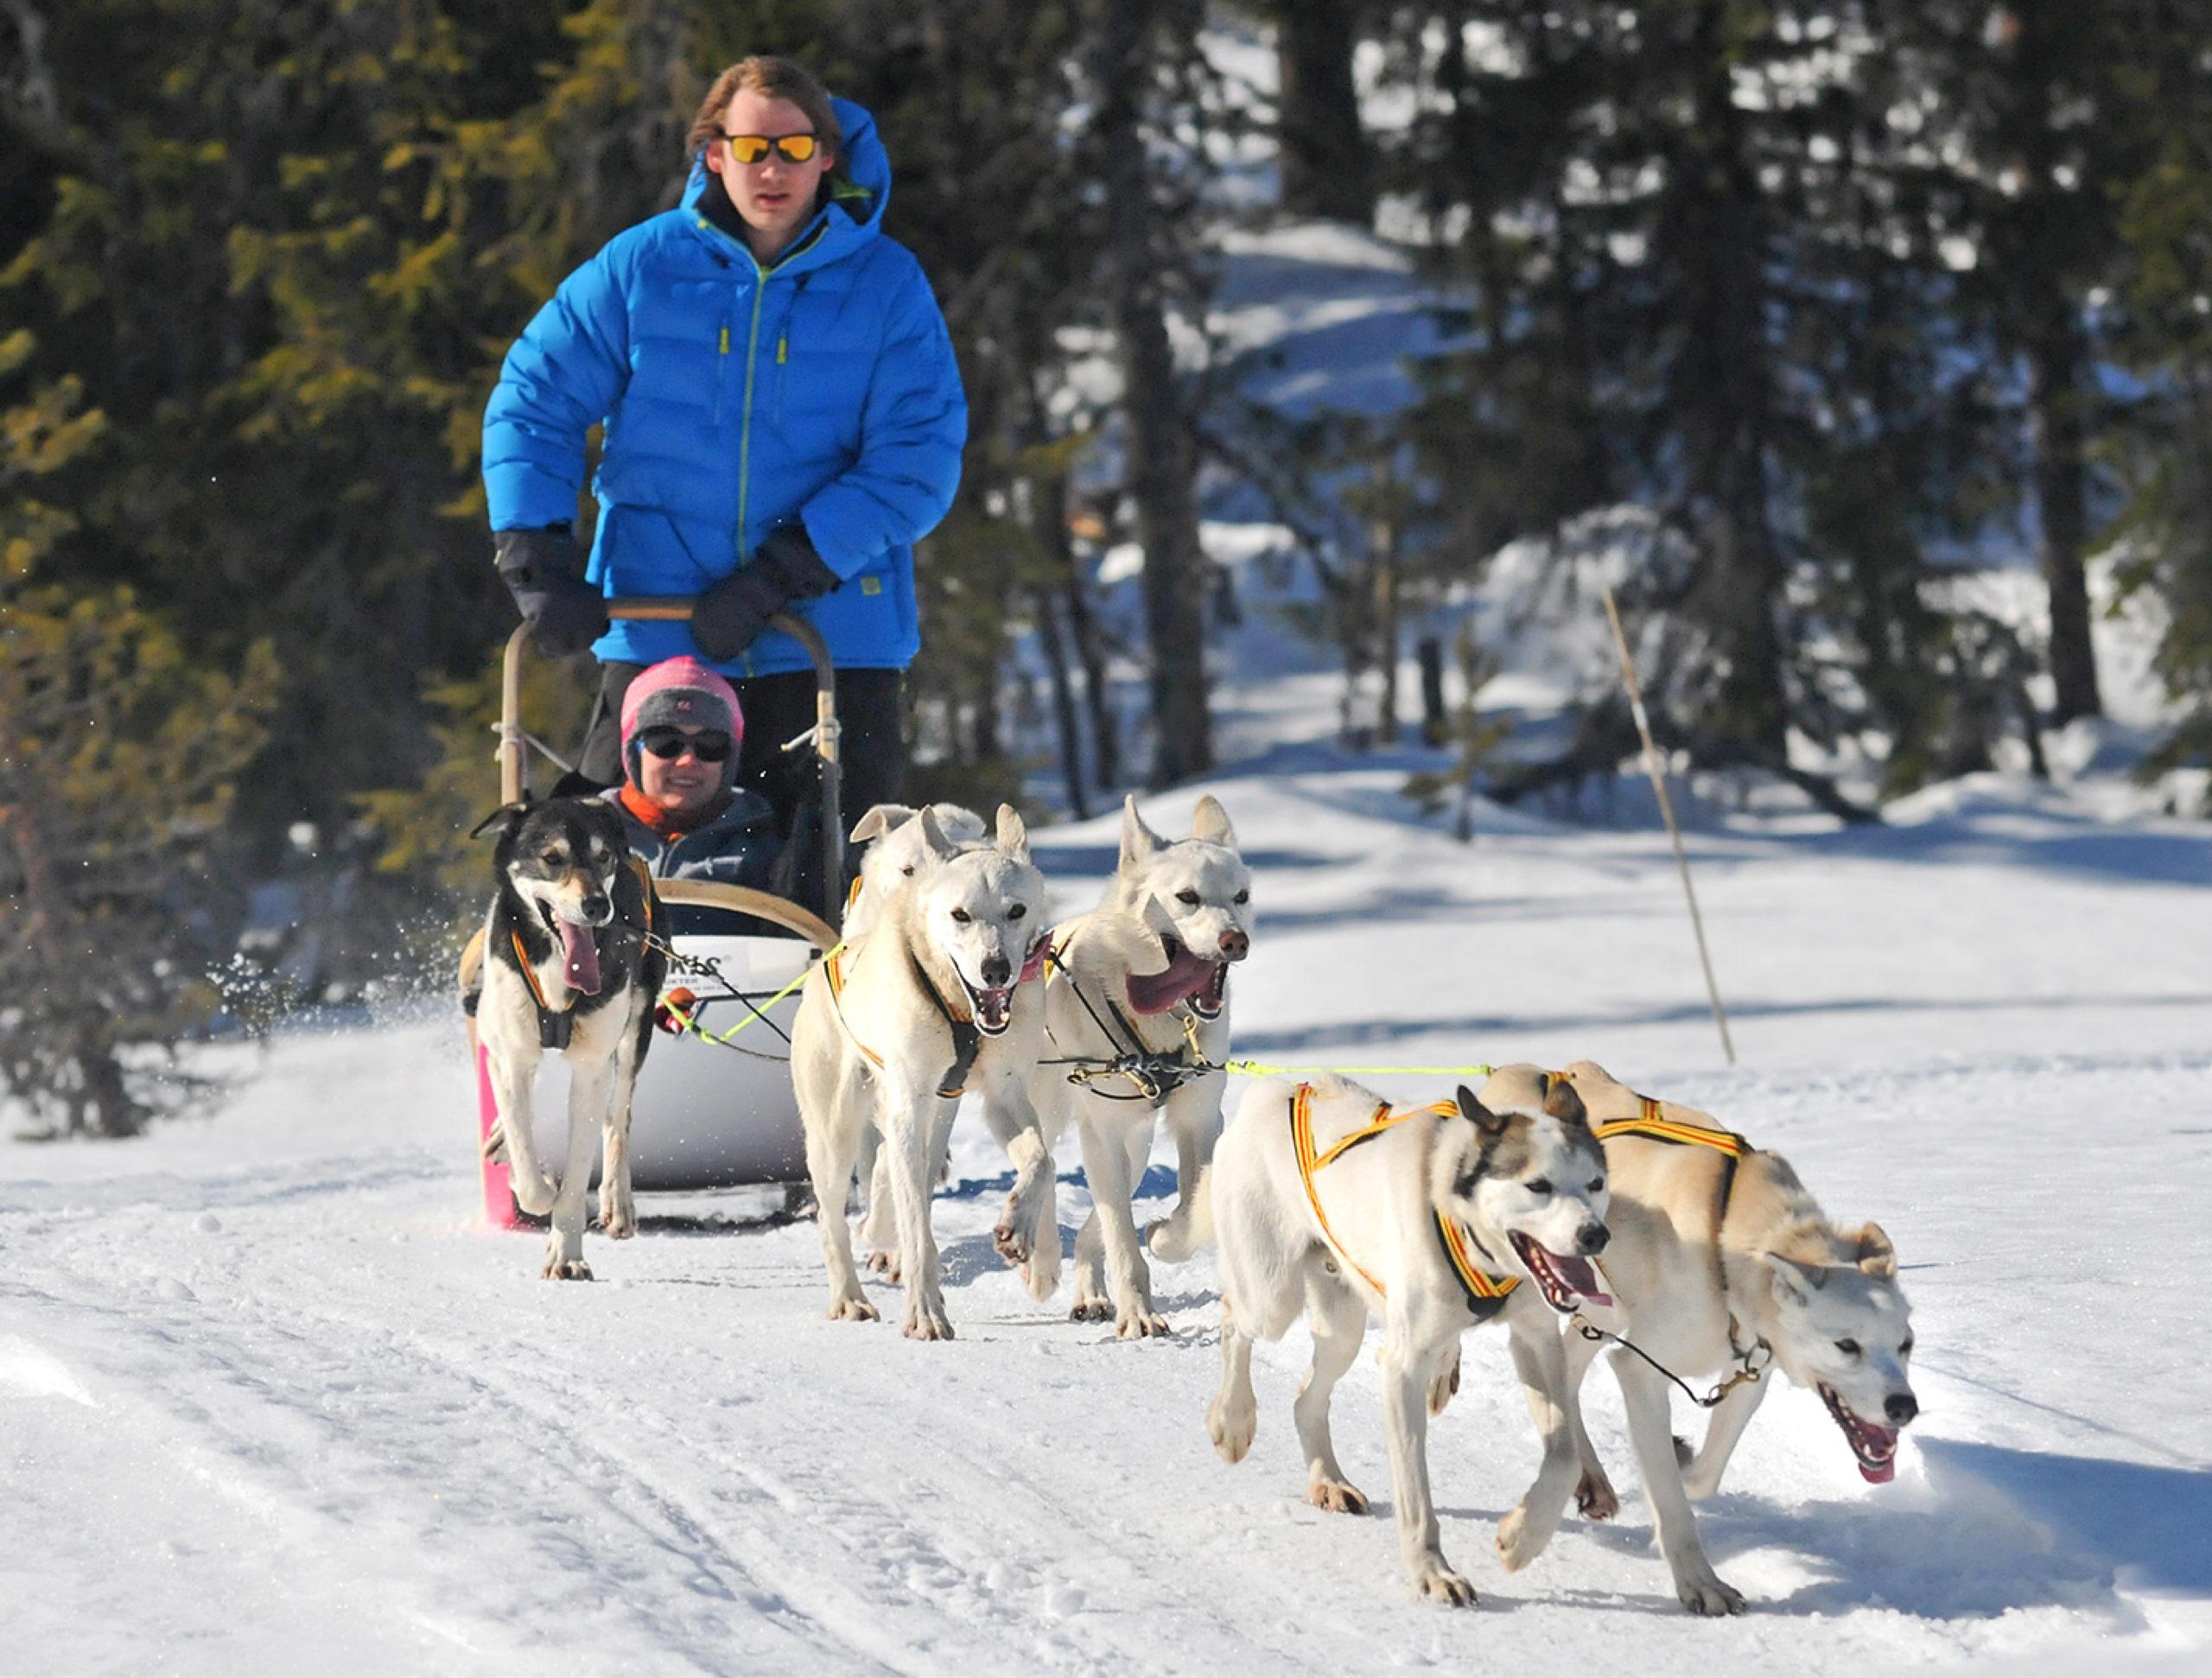 Friends on dog sledding in Trysil